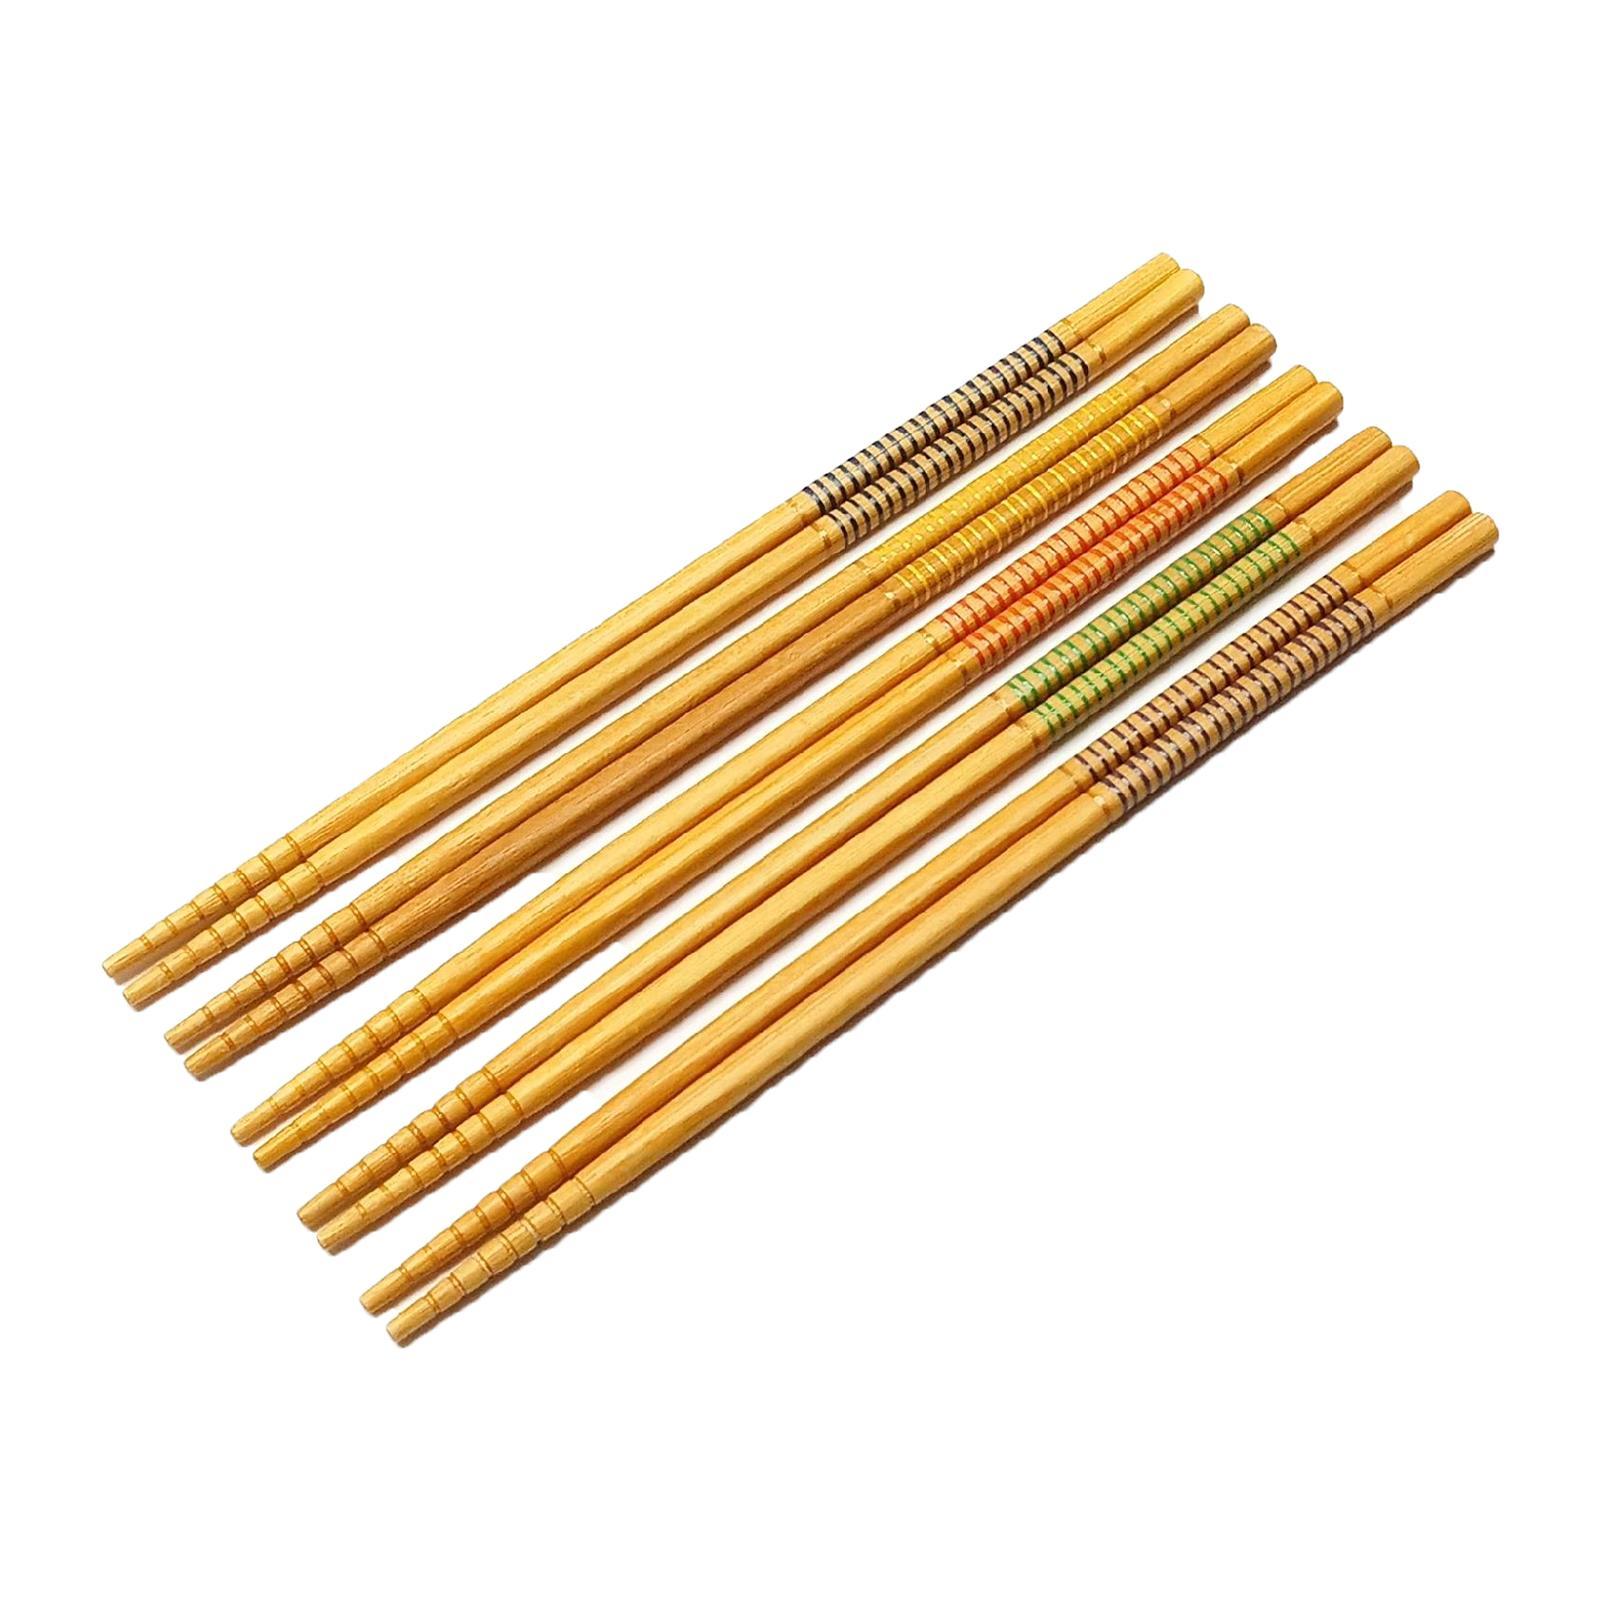 Vesta Bamboo Japanese Chopsticks 22.5CM (5PCS)